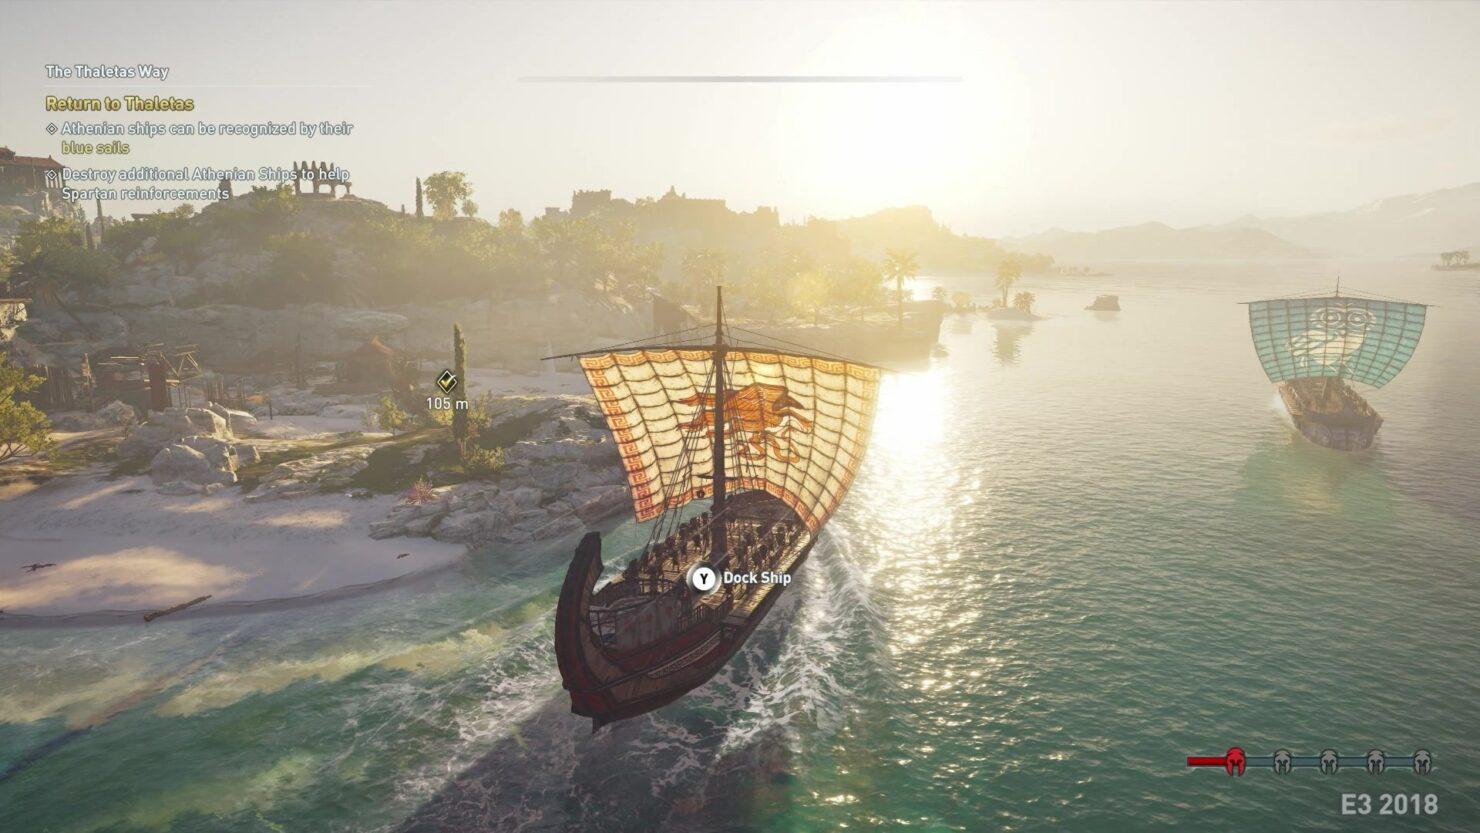 assassins-creed-odyssey-screenshot-leak-screenshot-12